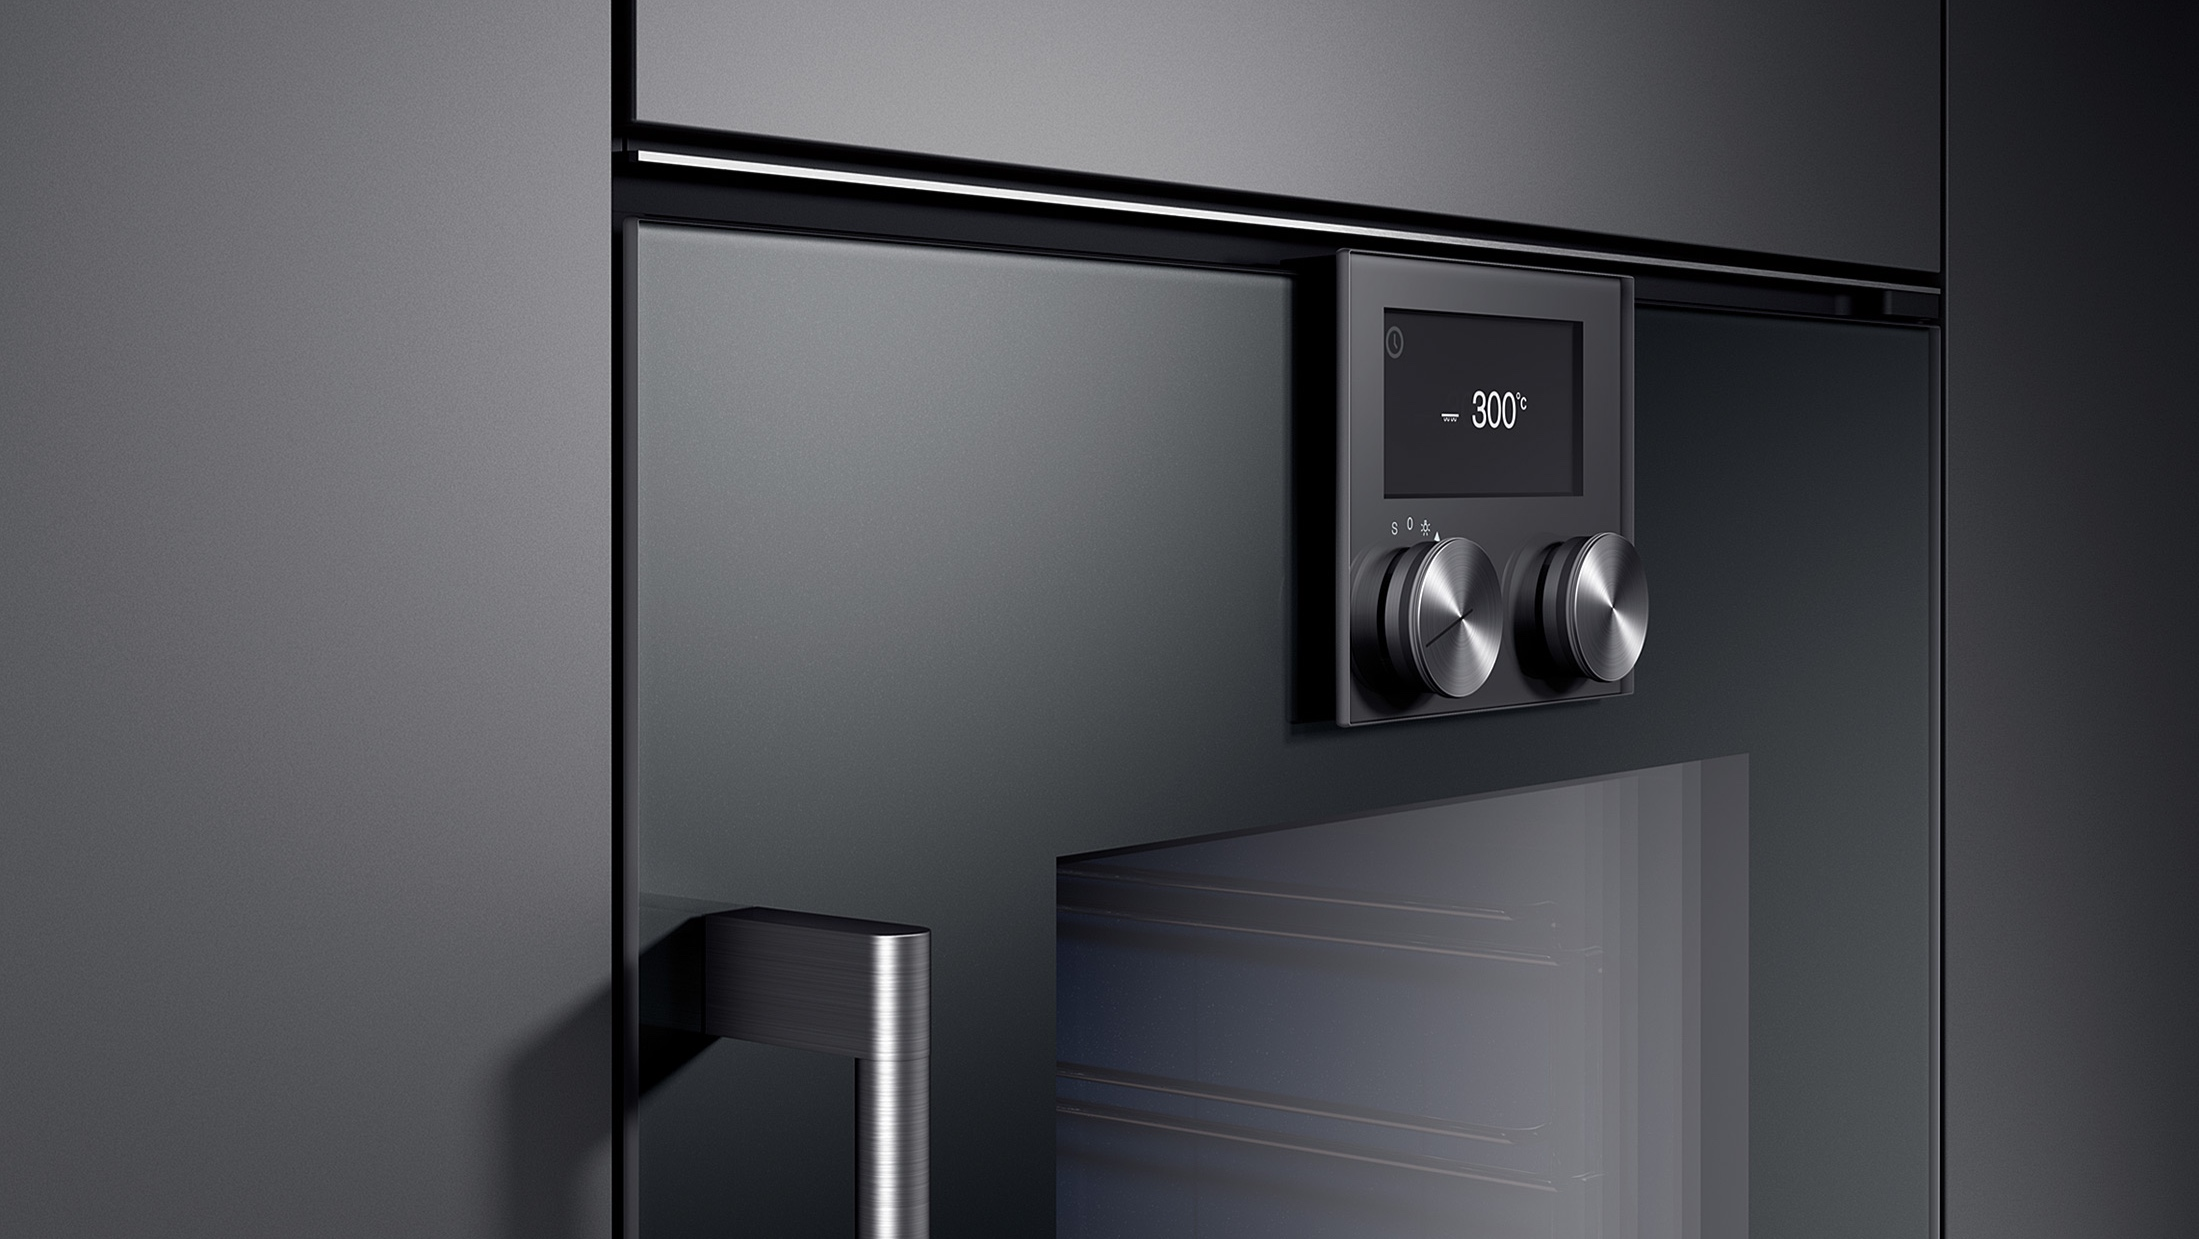 oven-series-200-5.jpg